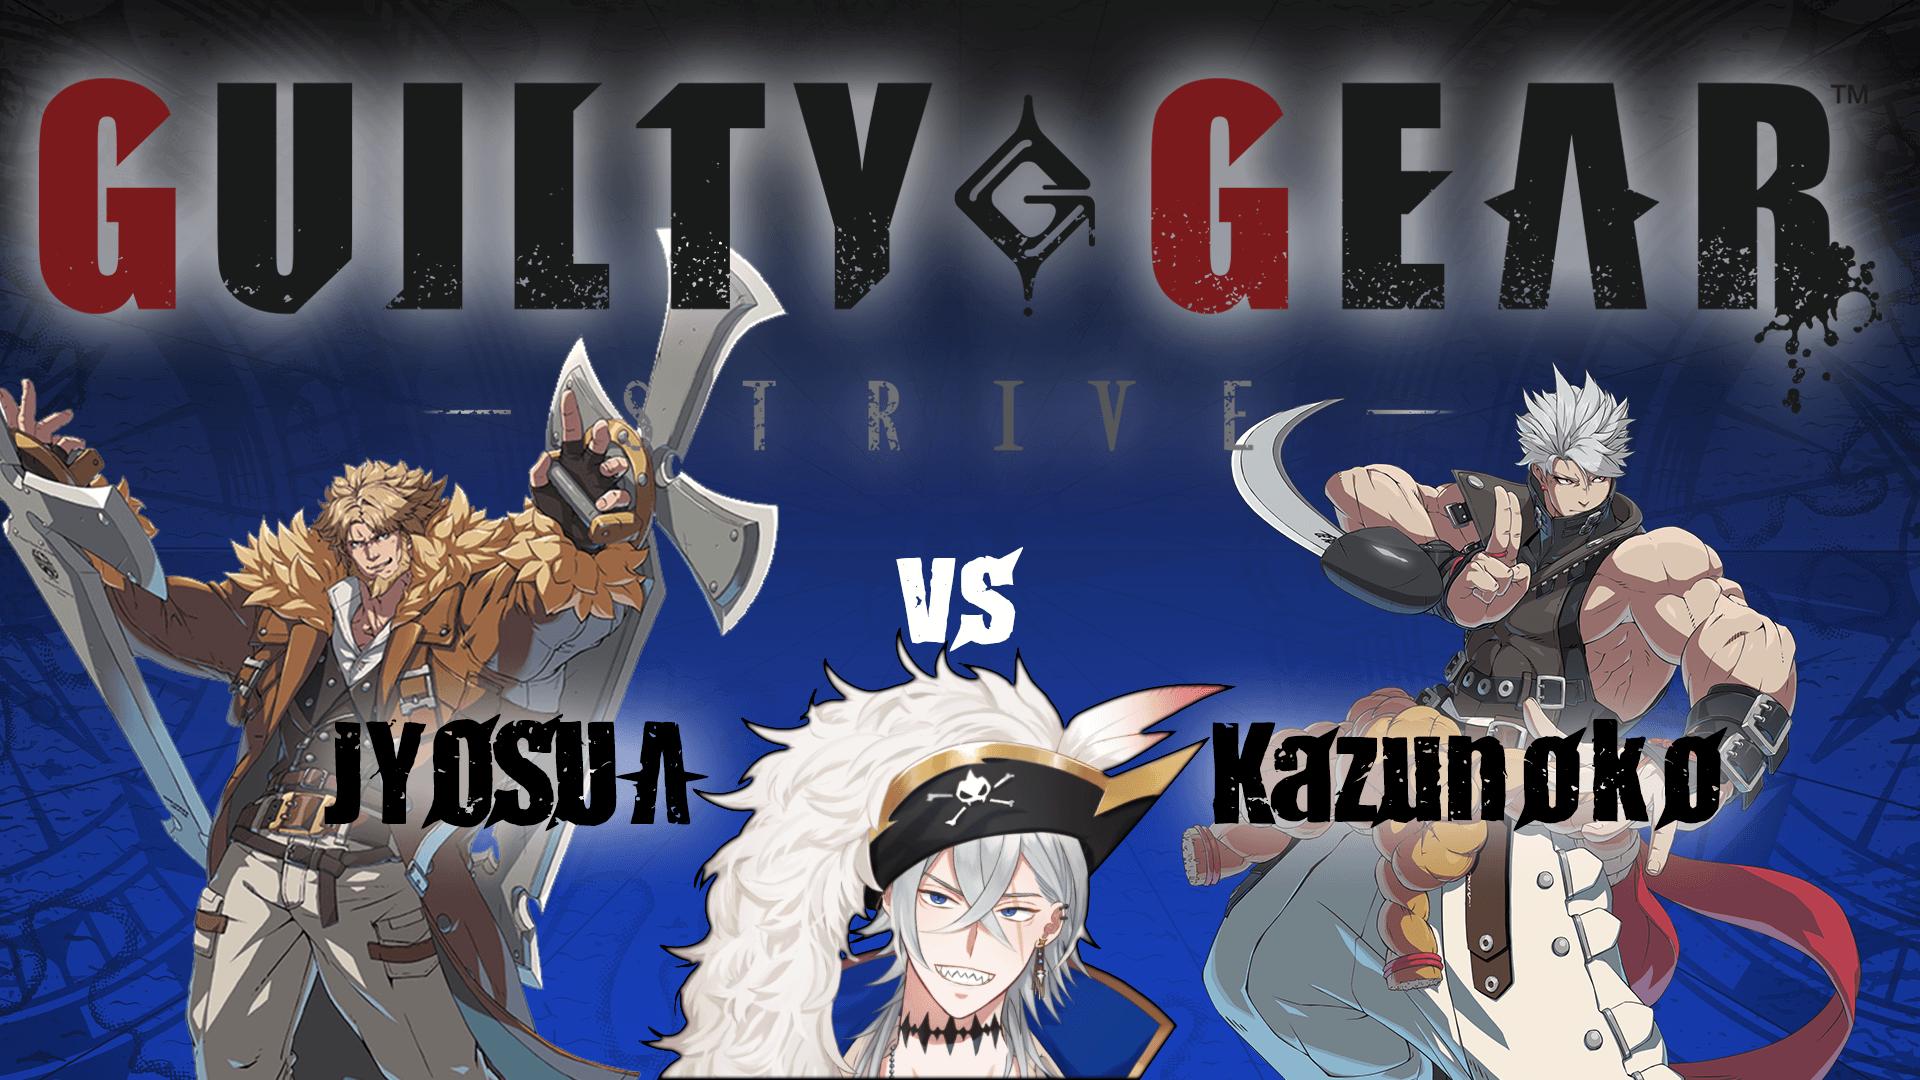 Guilty Gear Strive – Jyosua Leo vs Kazunoko Chipp